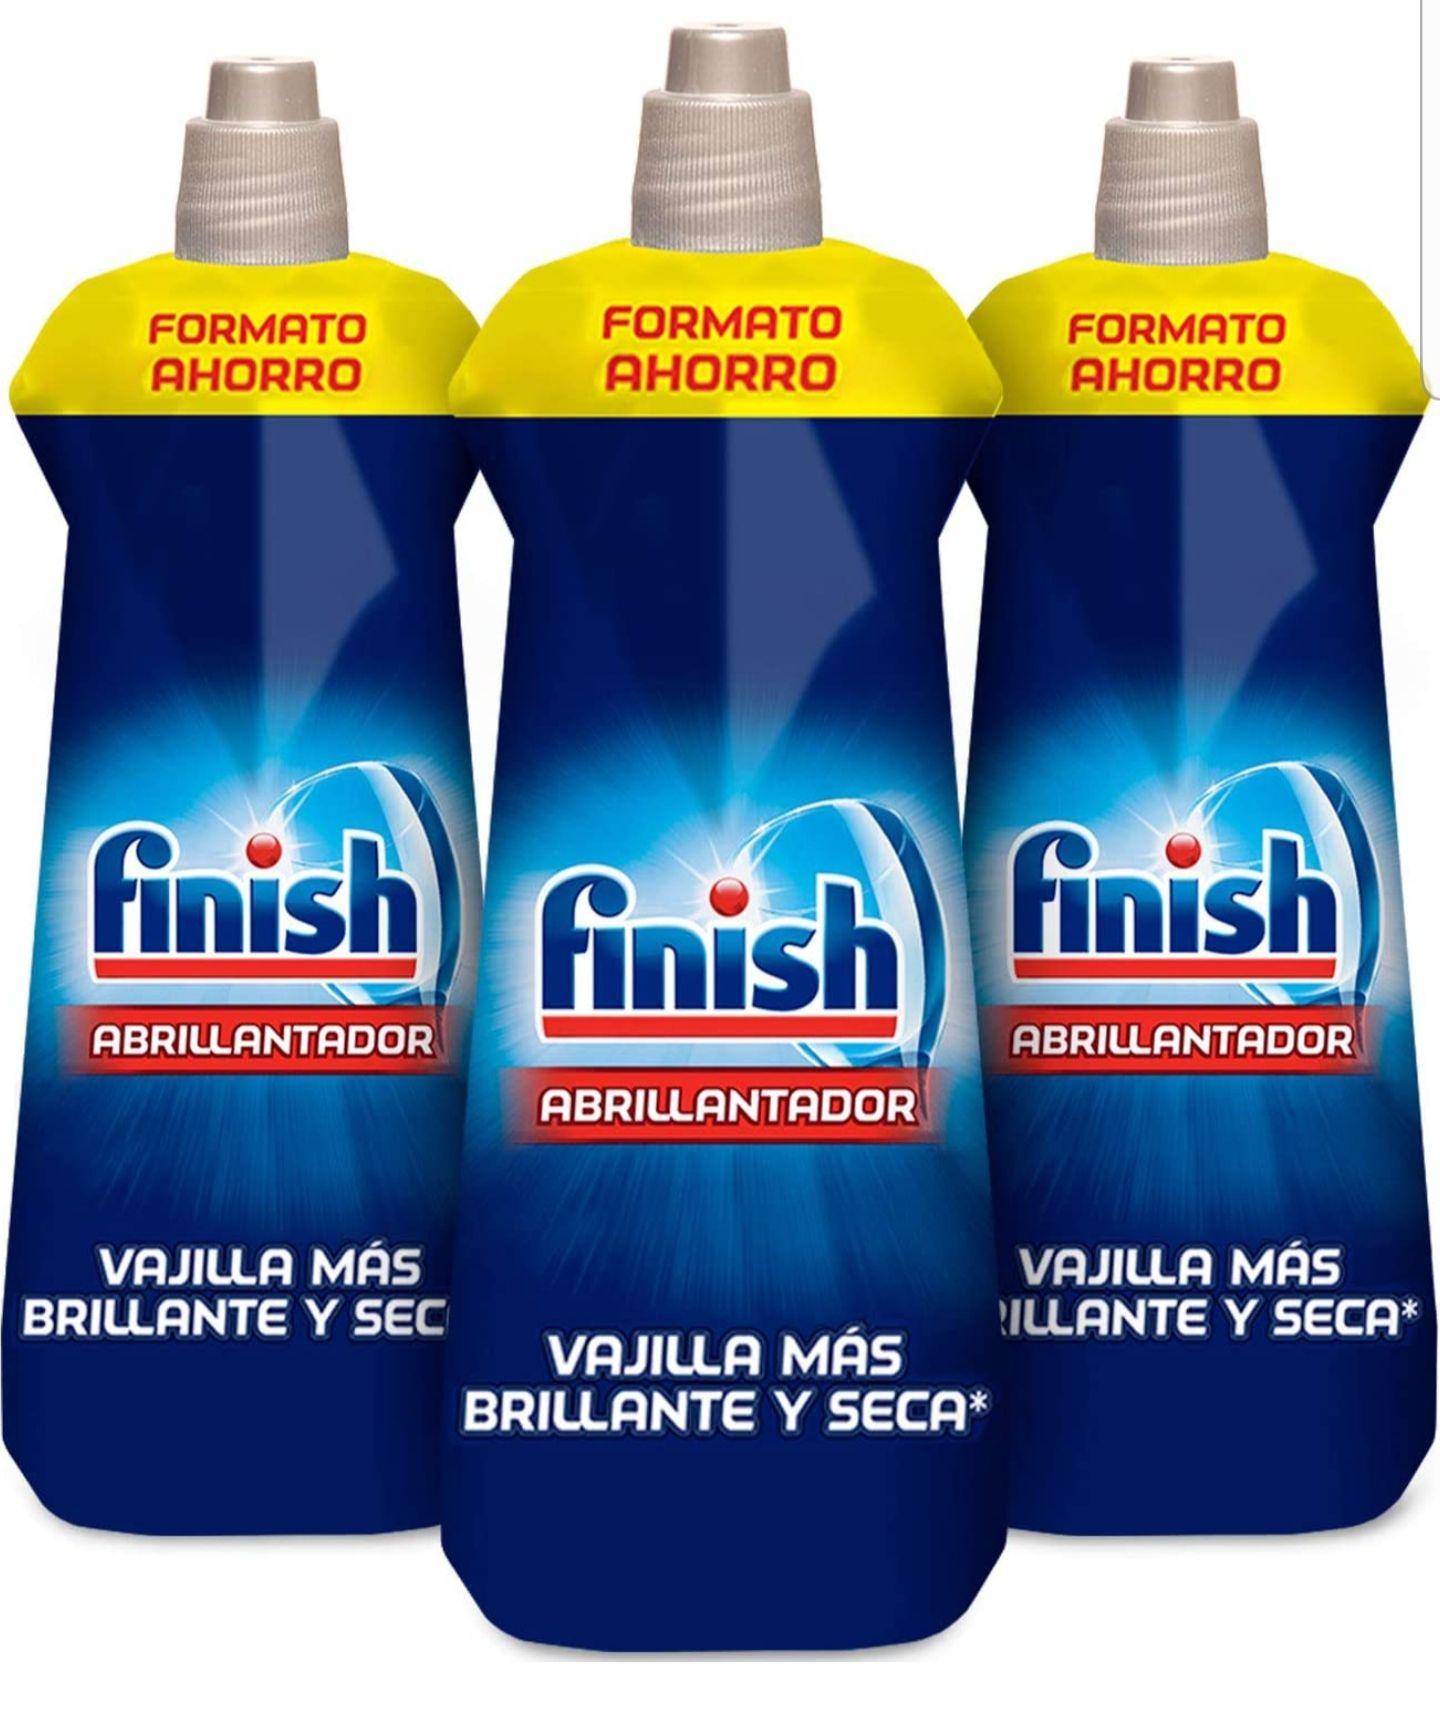 Finish Triple Abrillantador Lavavajillas - Pack de 3 unidades x 800 ml